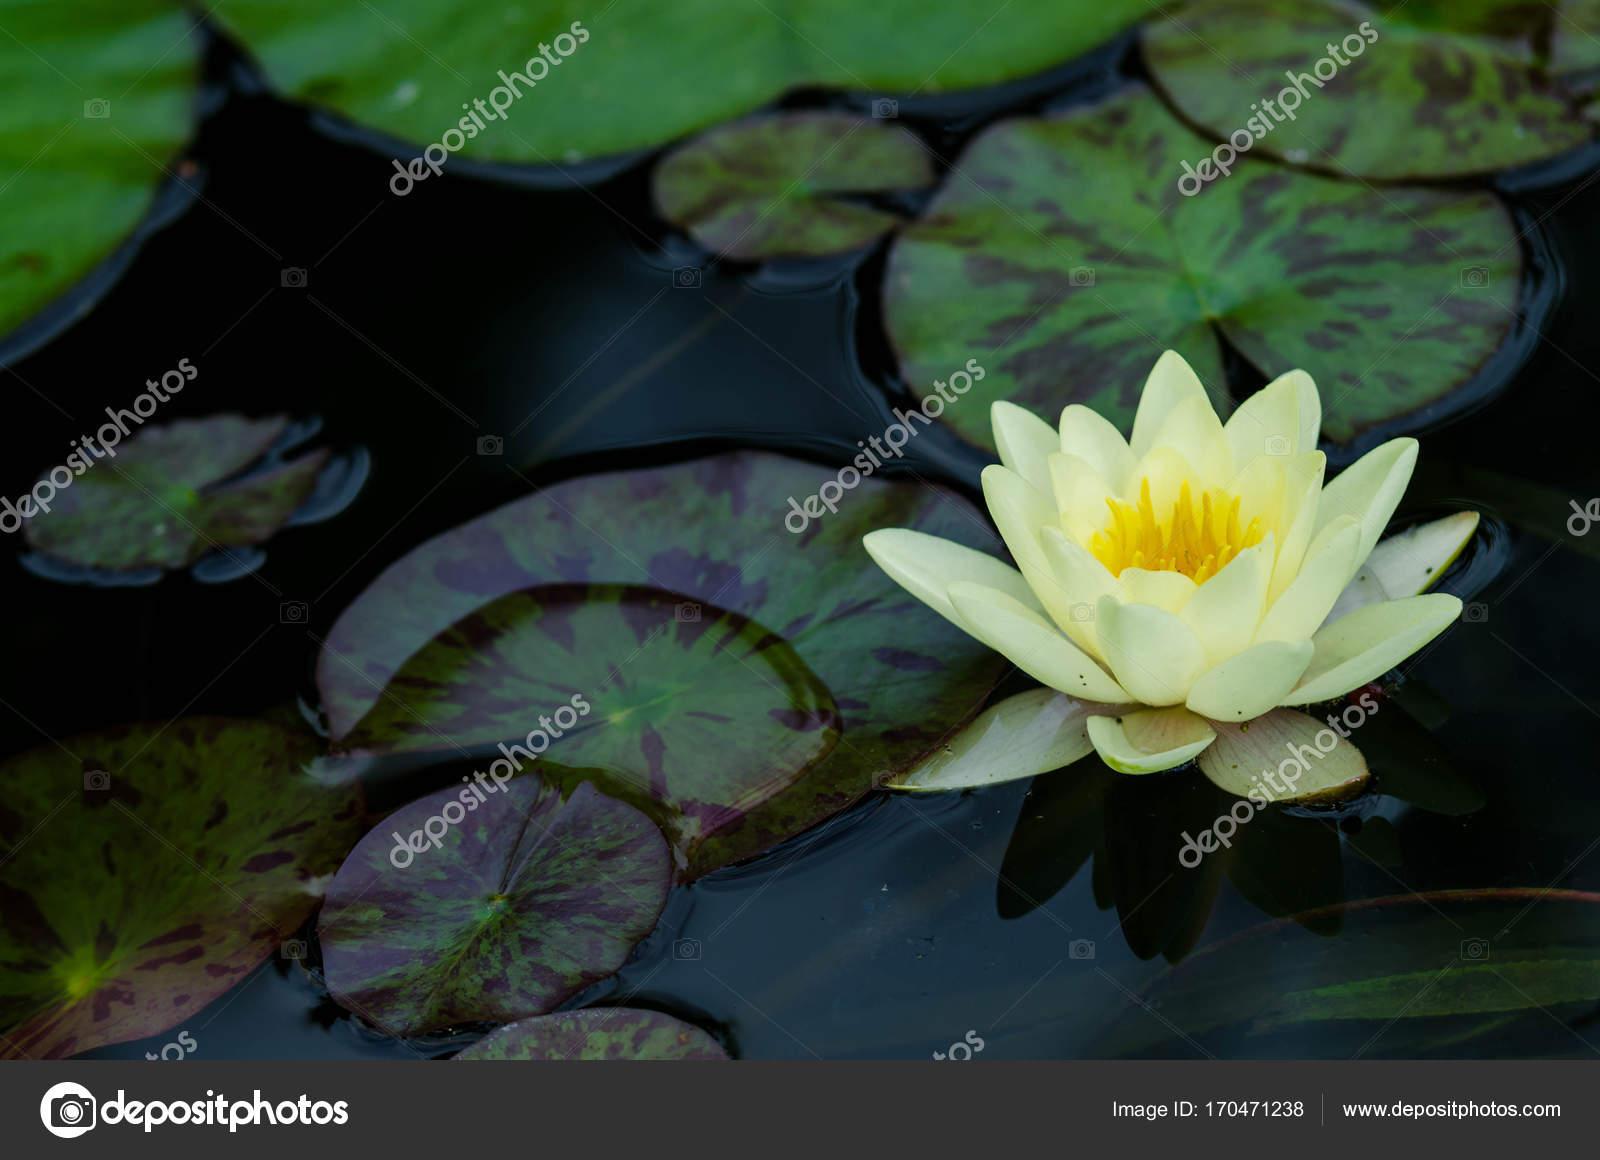 Beautiful lotus flower stock photo klagyivik 170471238 beautiful lotus flower in water photo by klagyivik izmirmasajfo Images